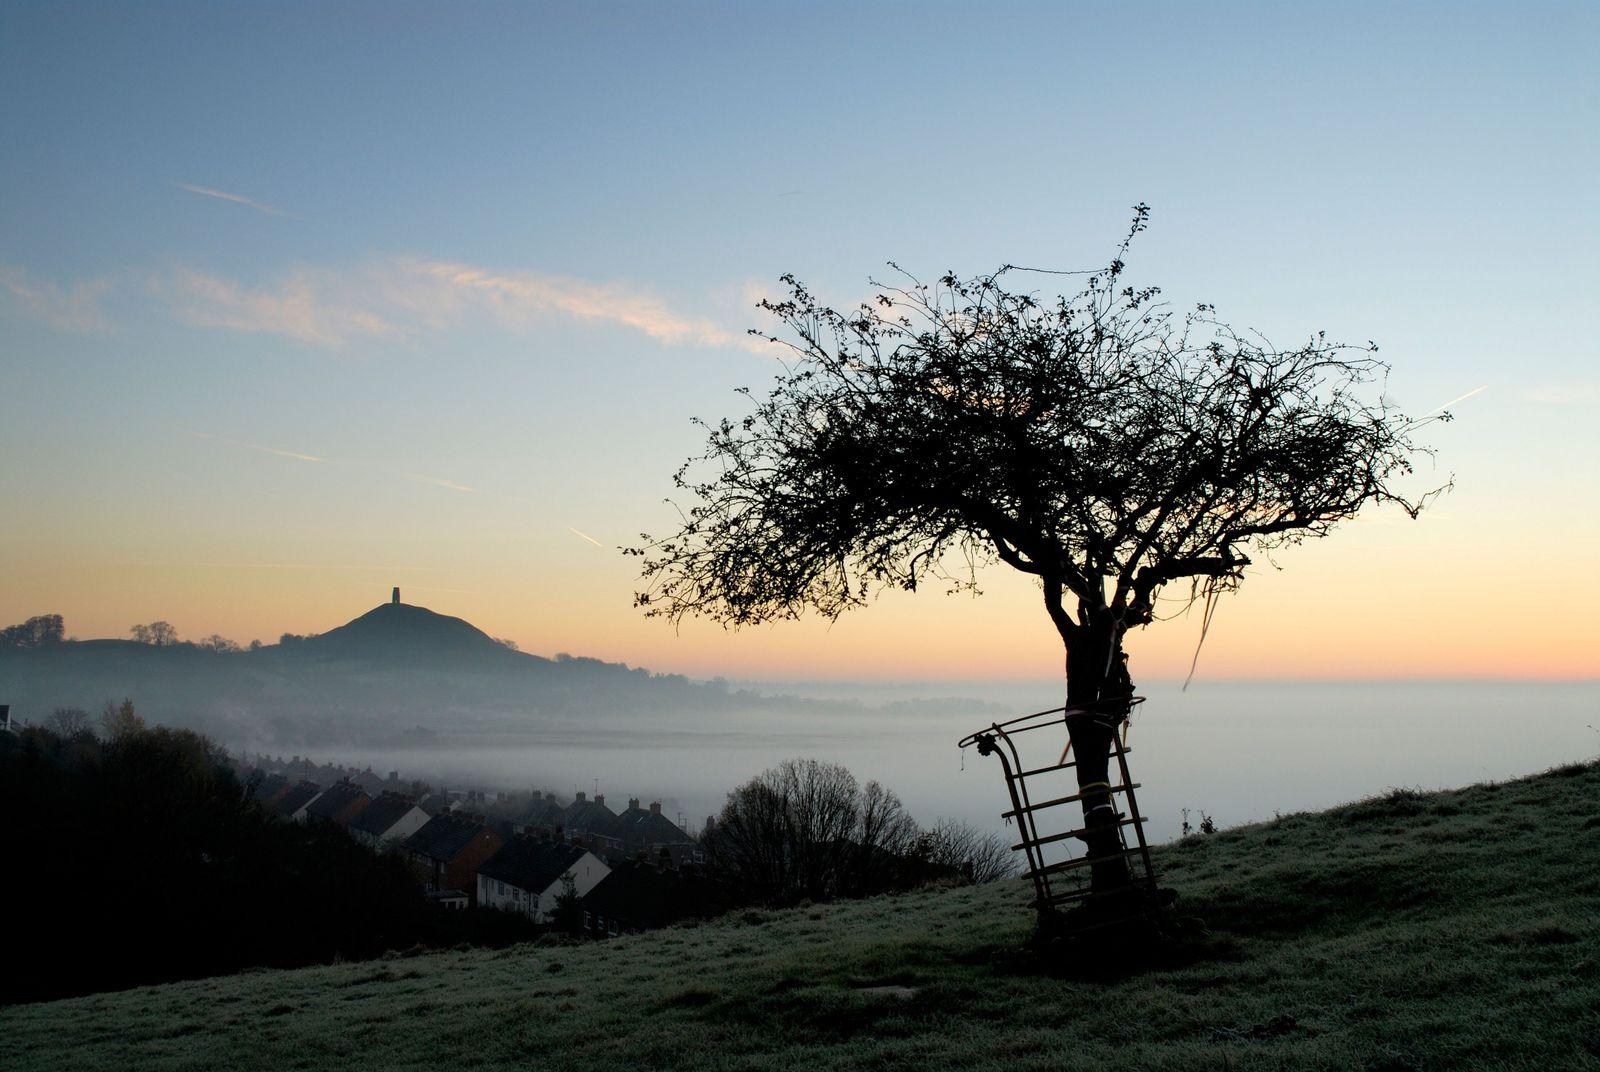 What makes Glastonbury so mystical?